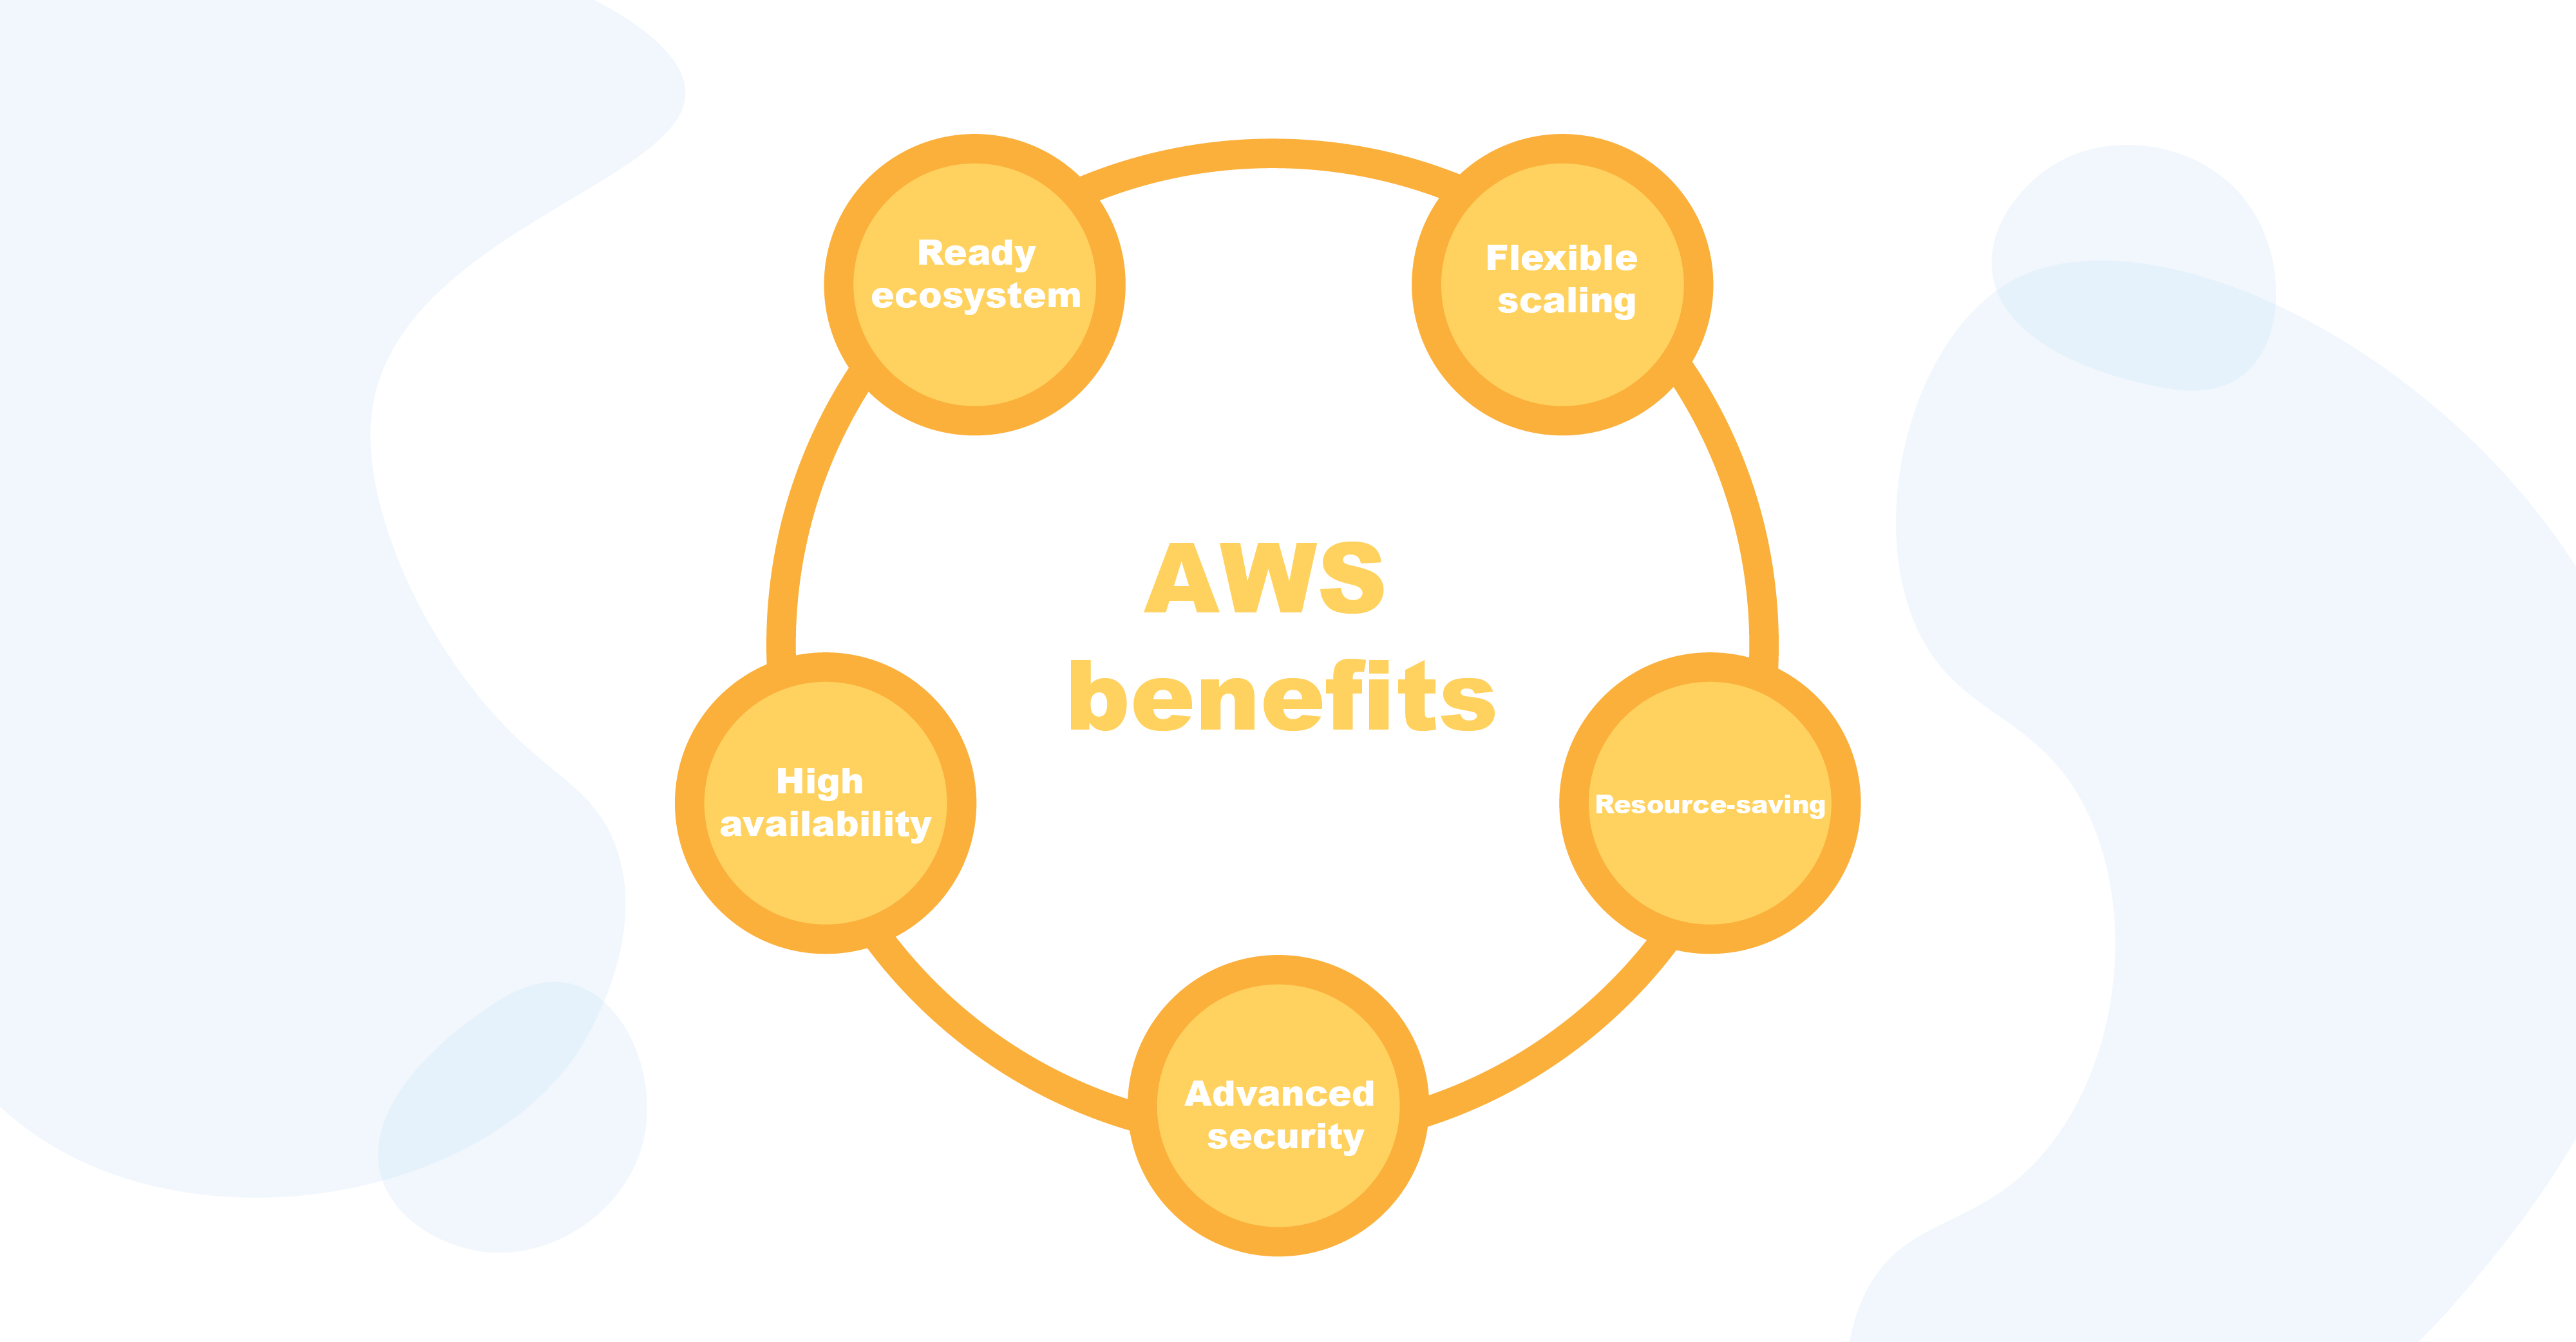 AWS benefits